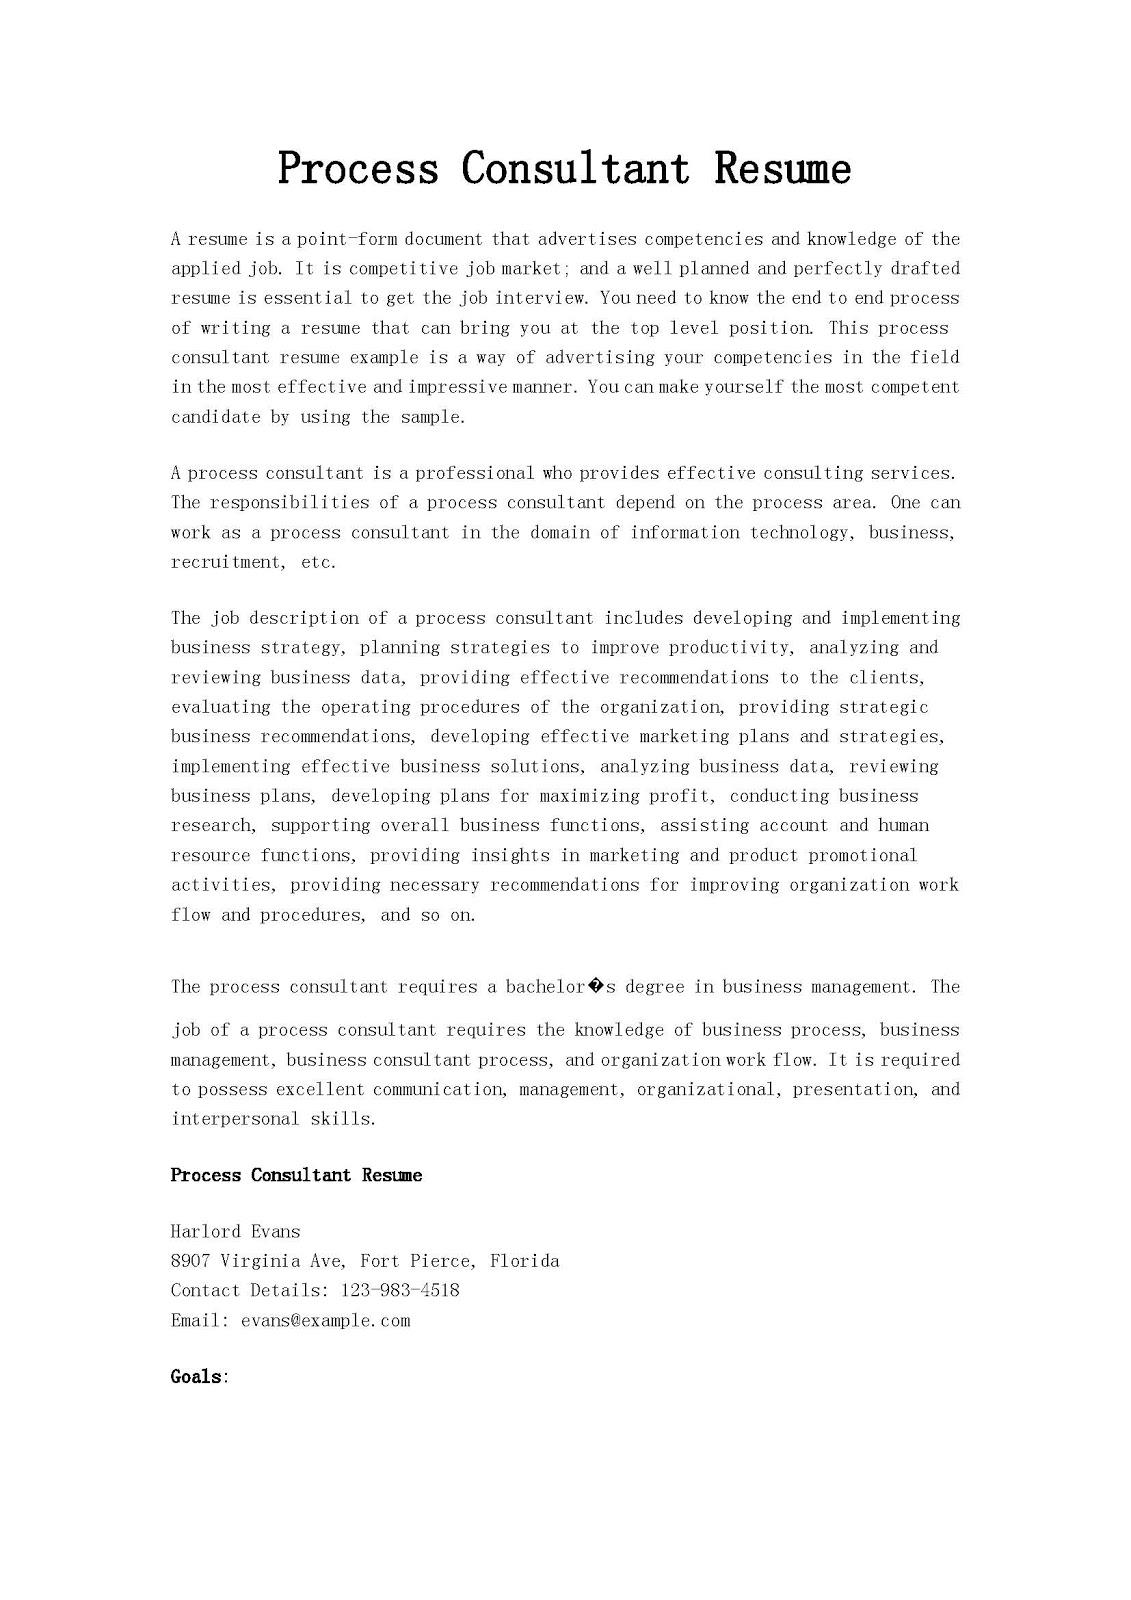 resume samples  process consultant resume